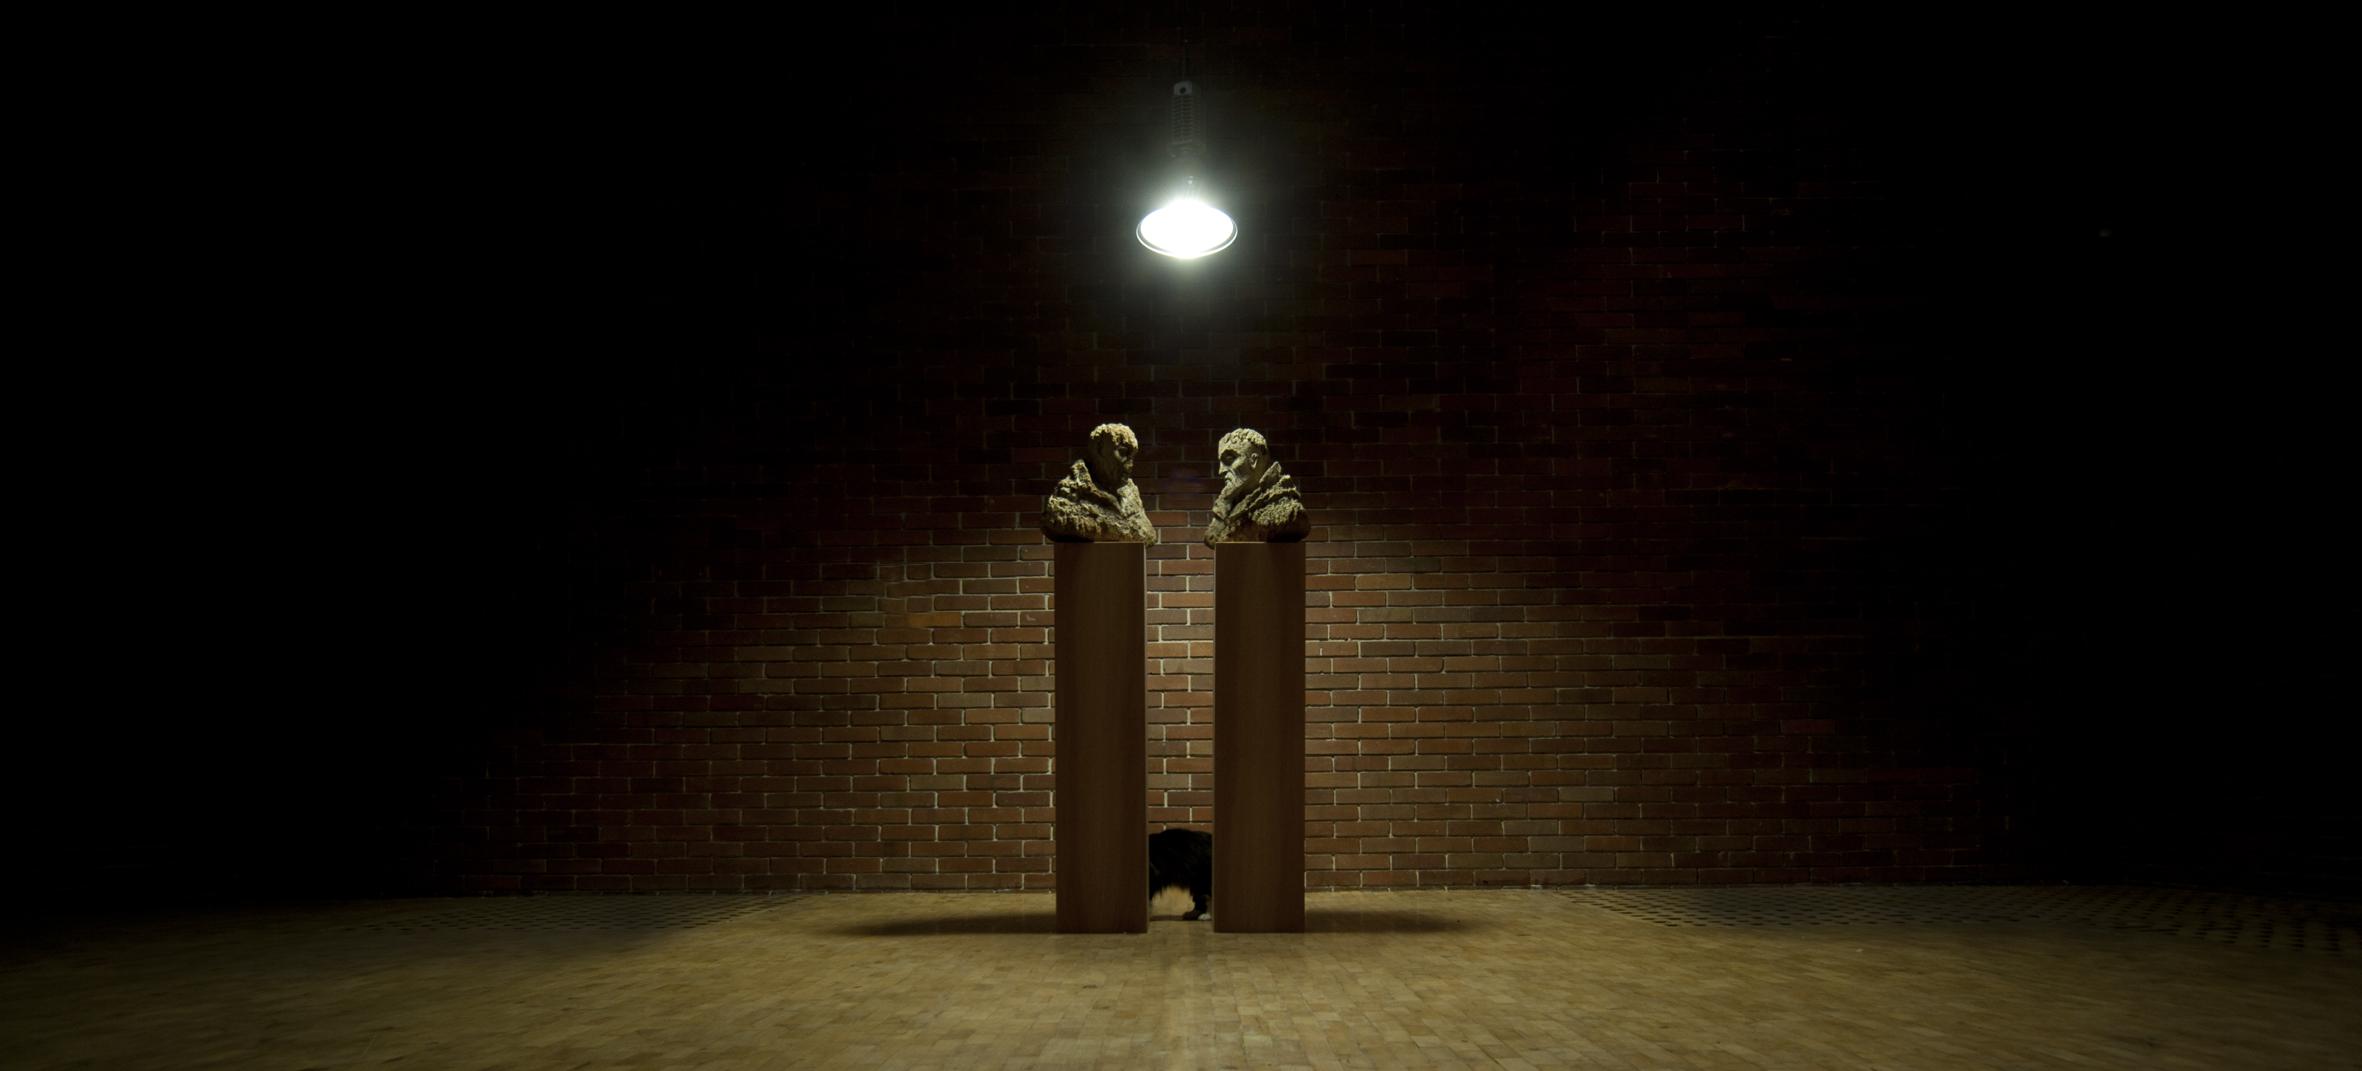 Homo Anobium St. Francis 100% Sculpture, Czekalska+Golec